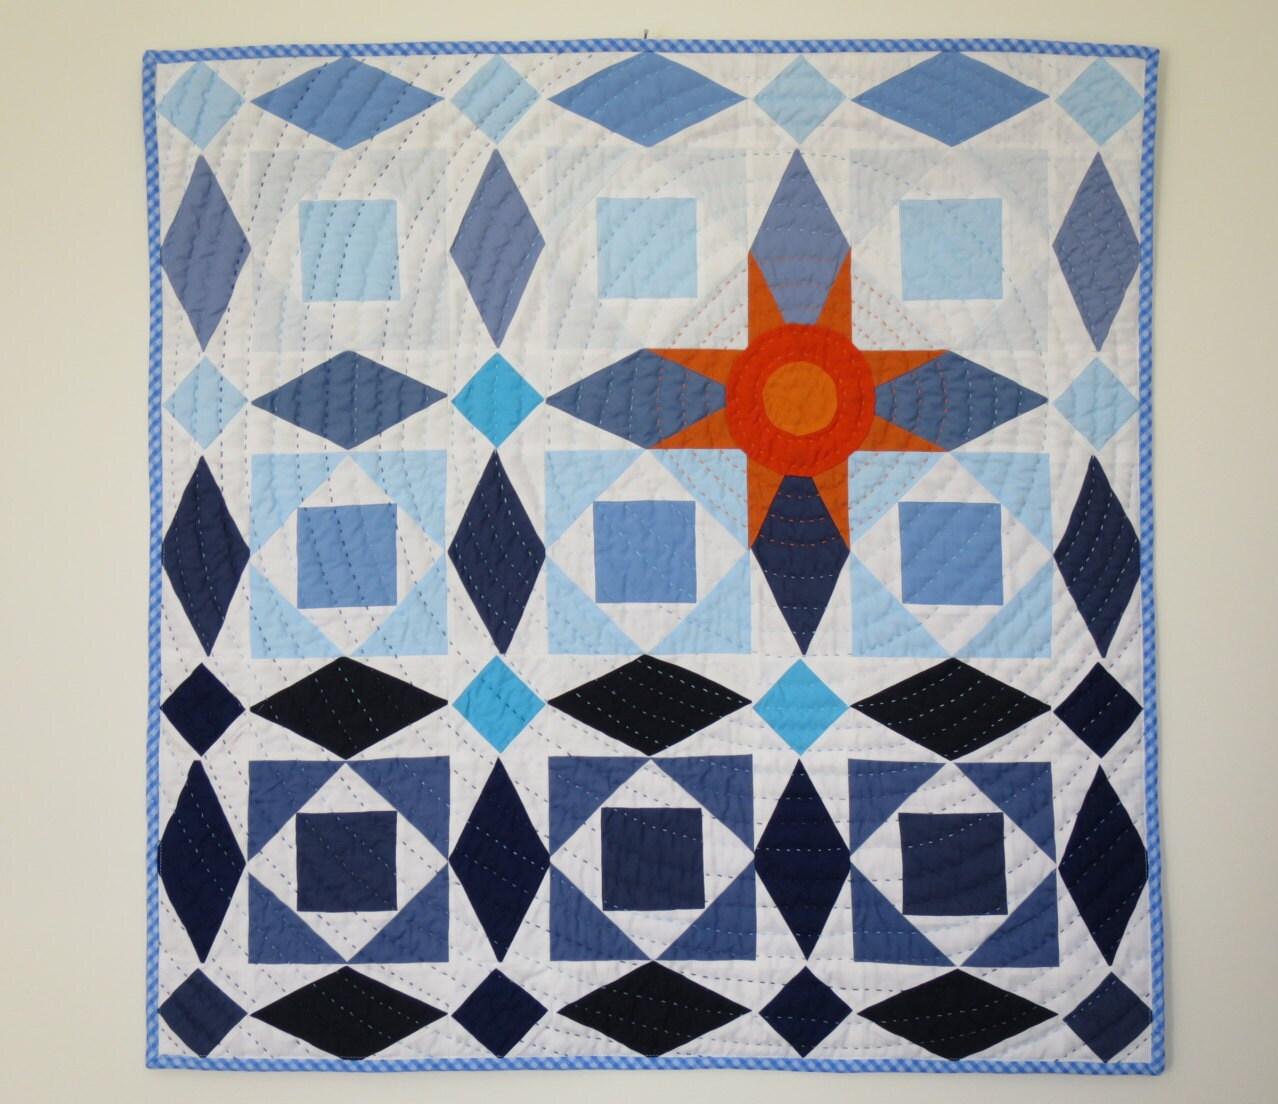 Wall Hanging Fabric Decoration Fiber Art Wall Quilt